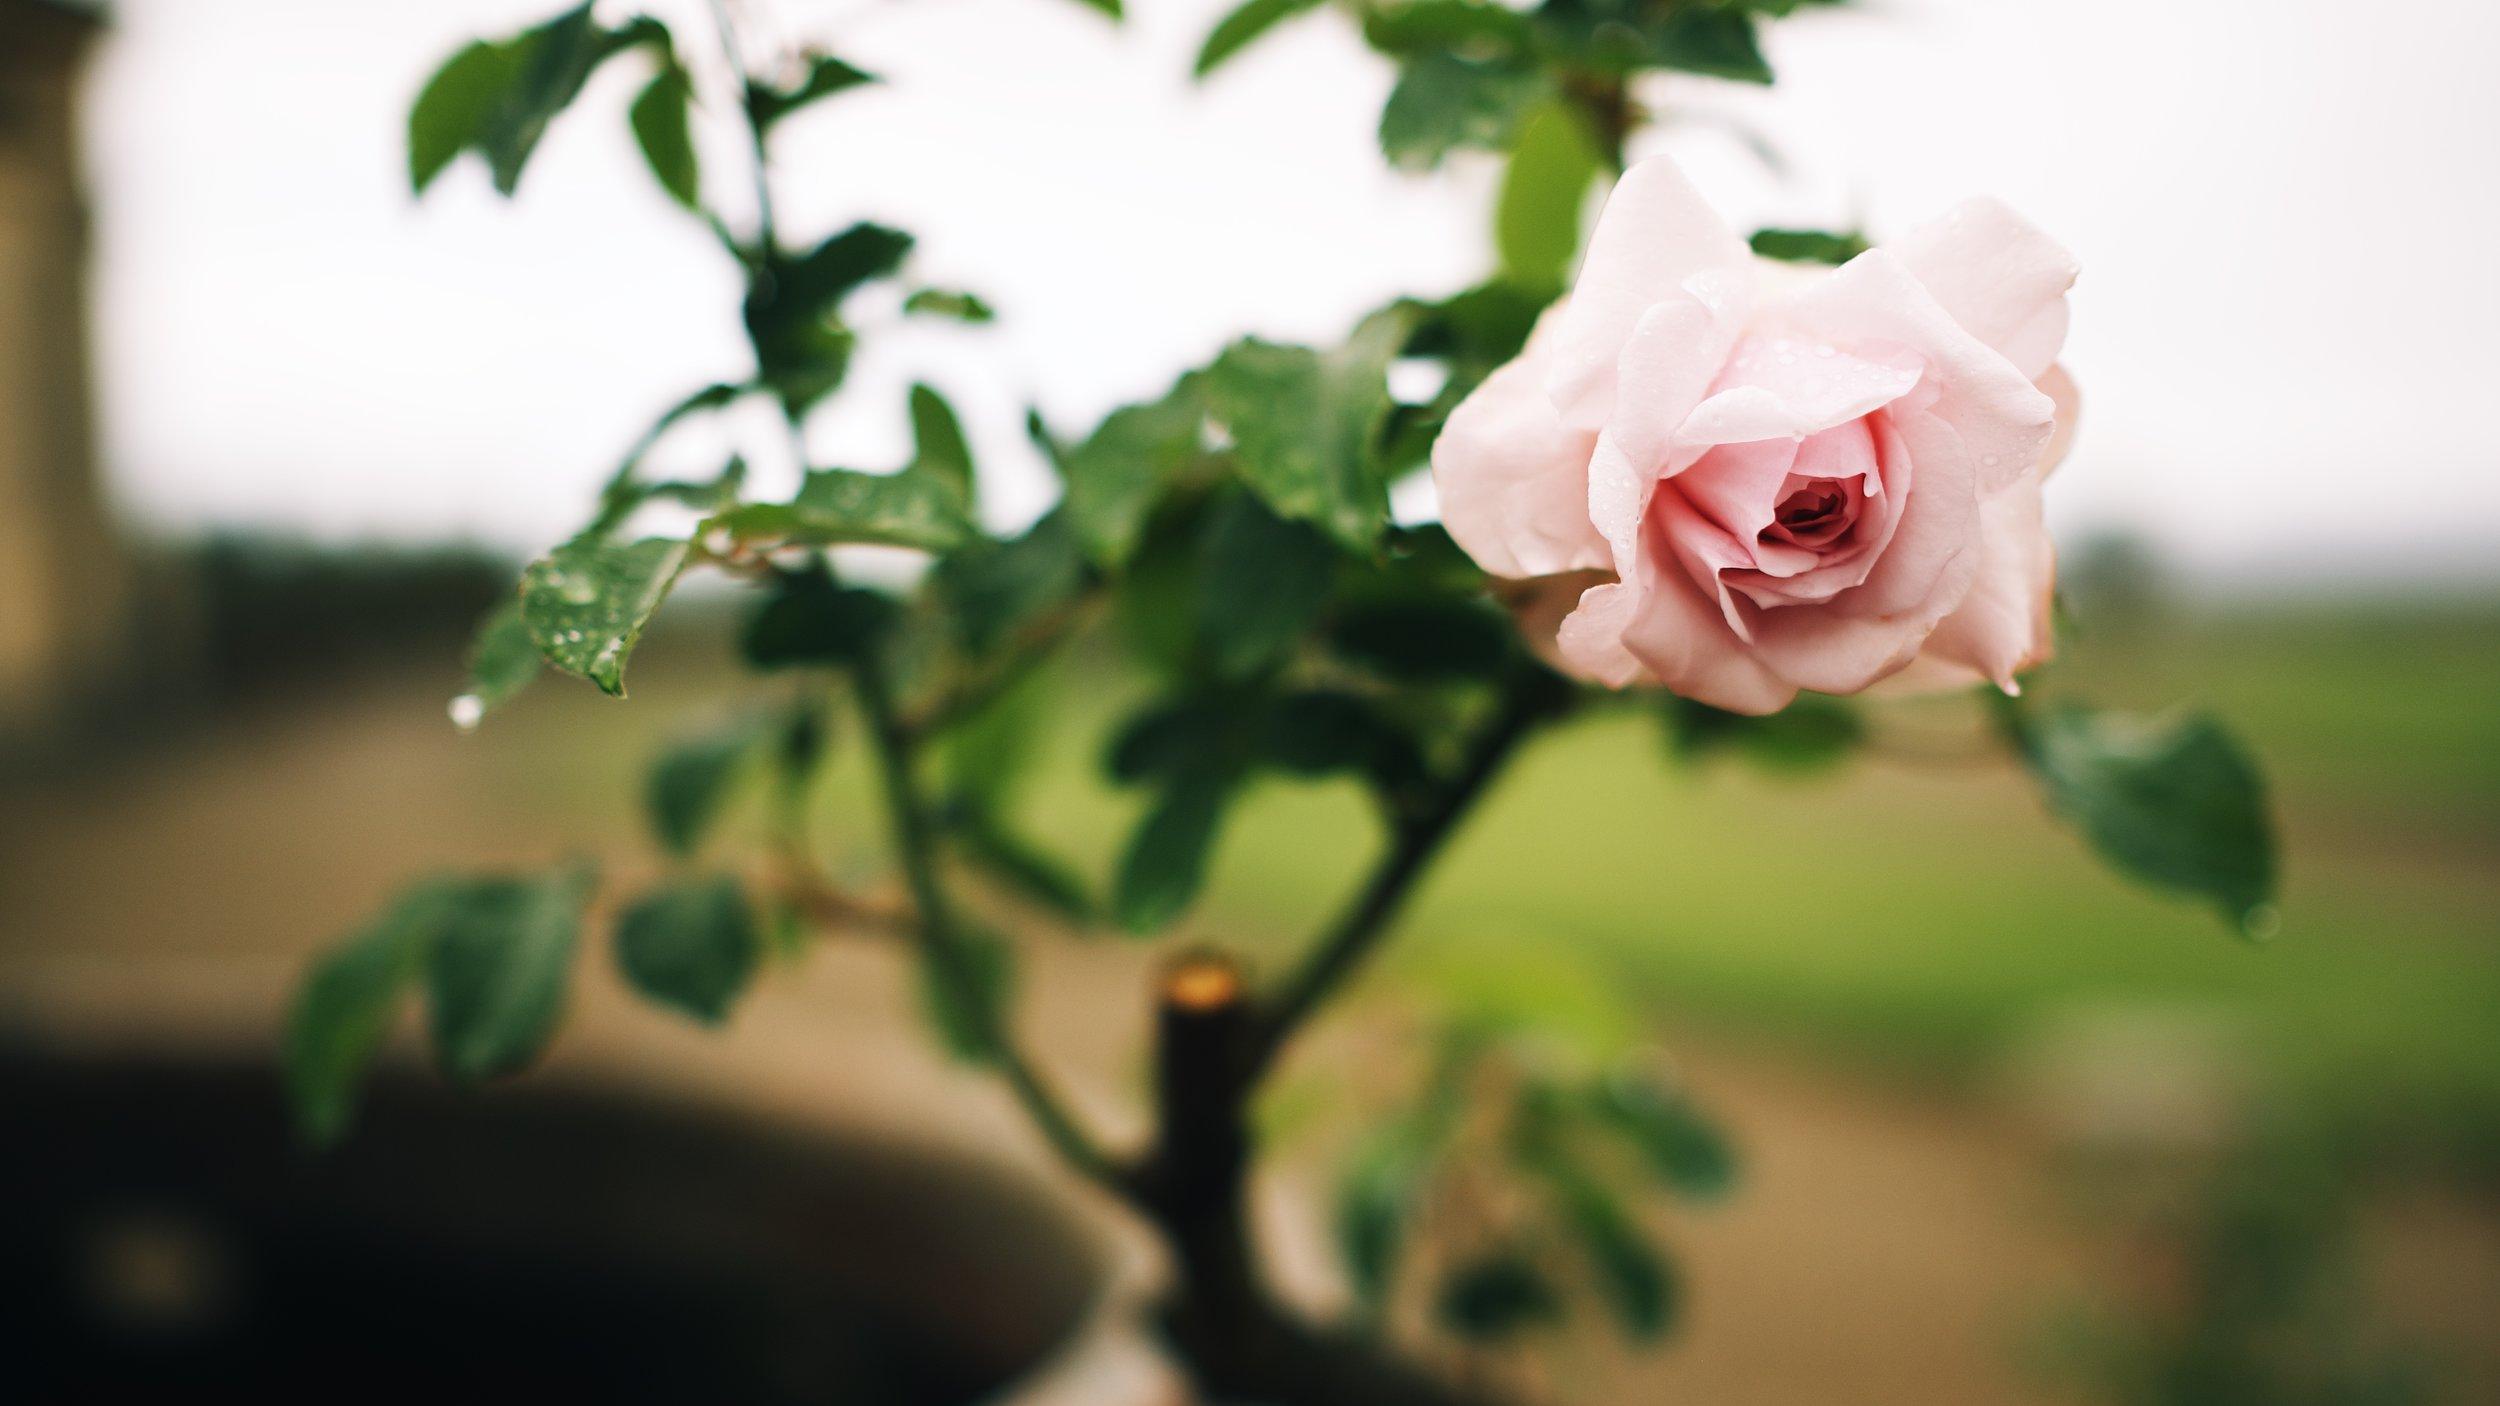 Rosa Di Medici.jpg